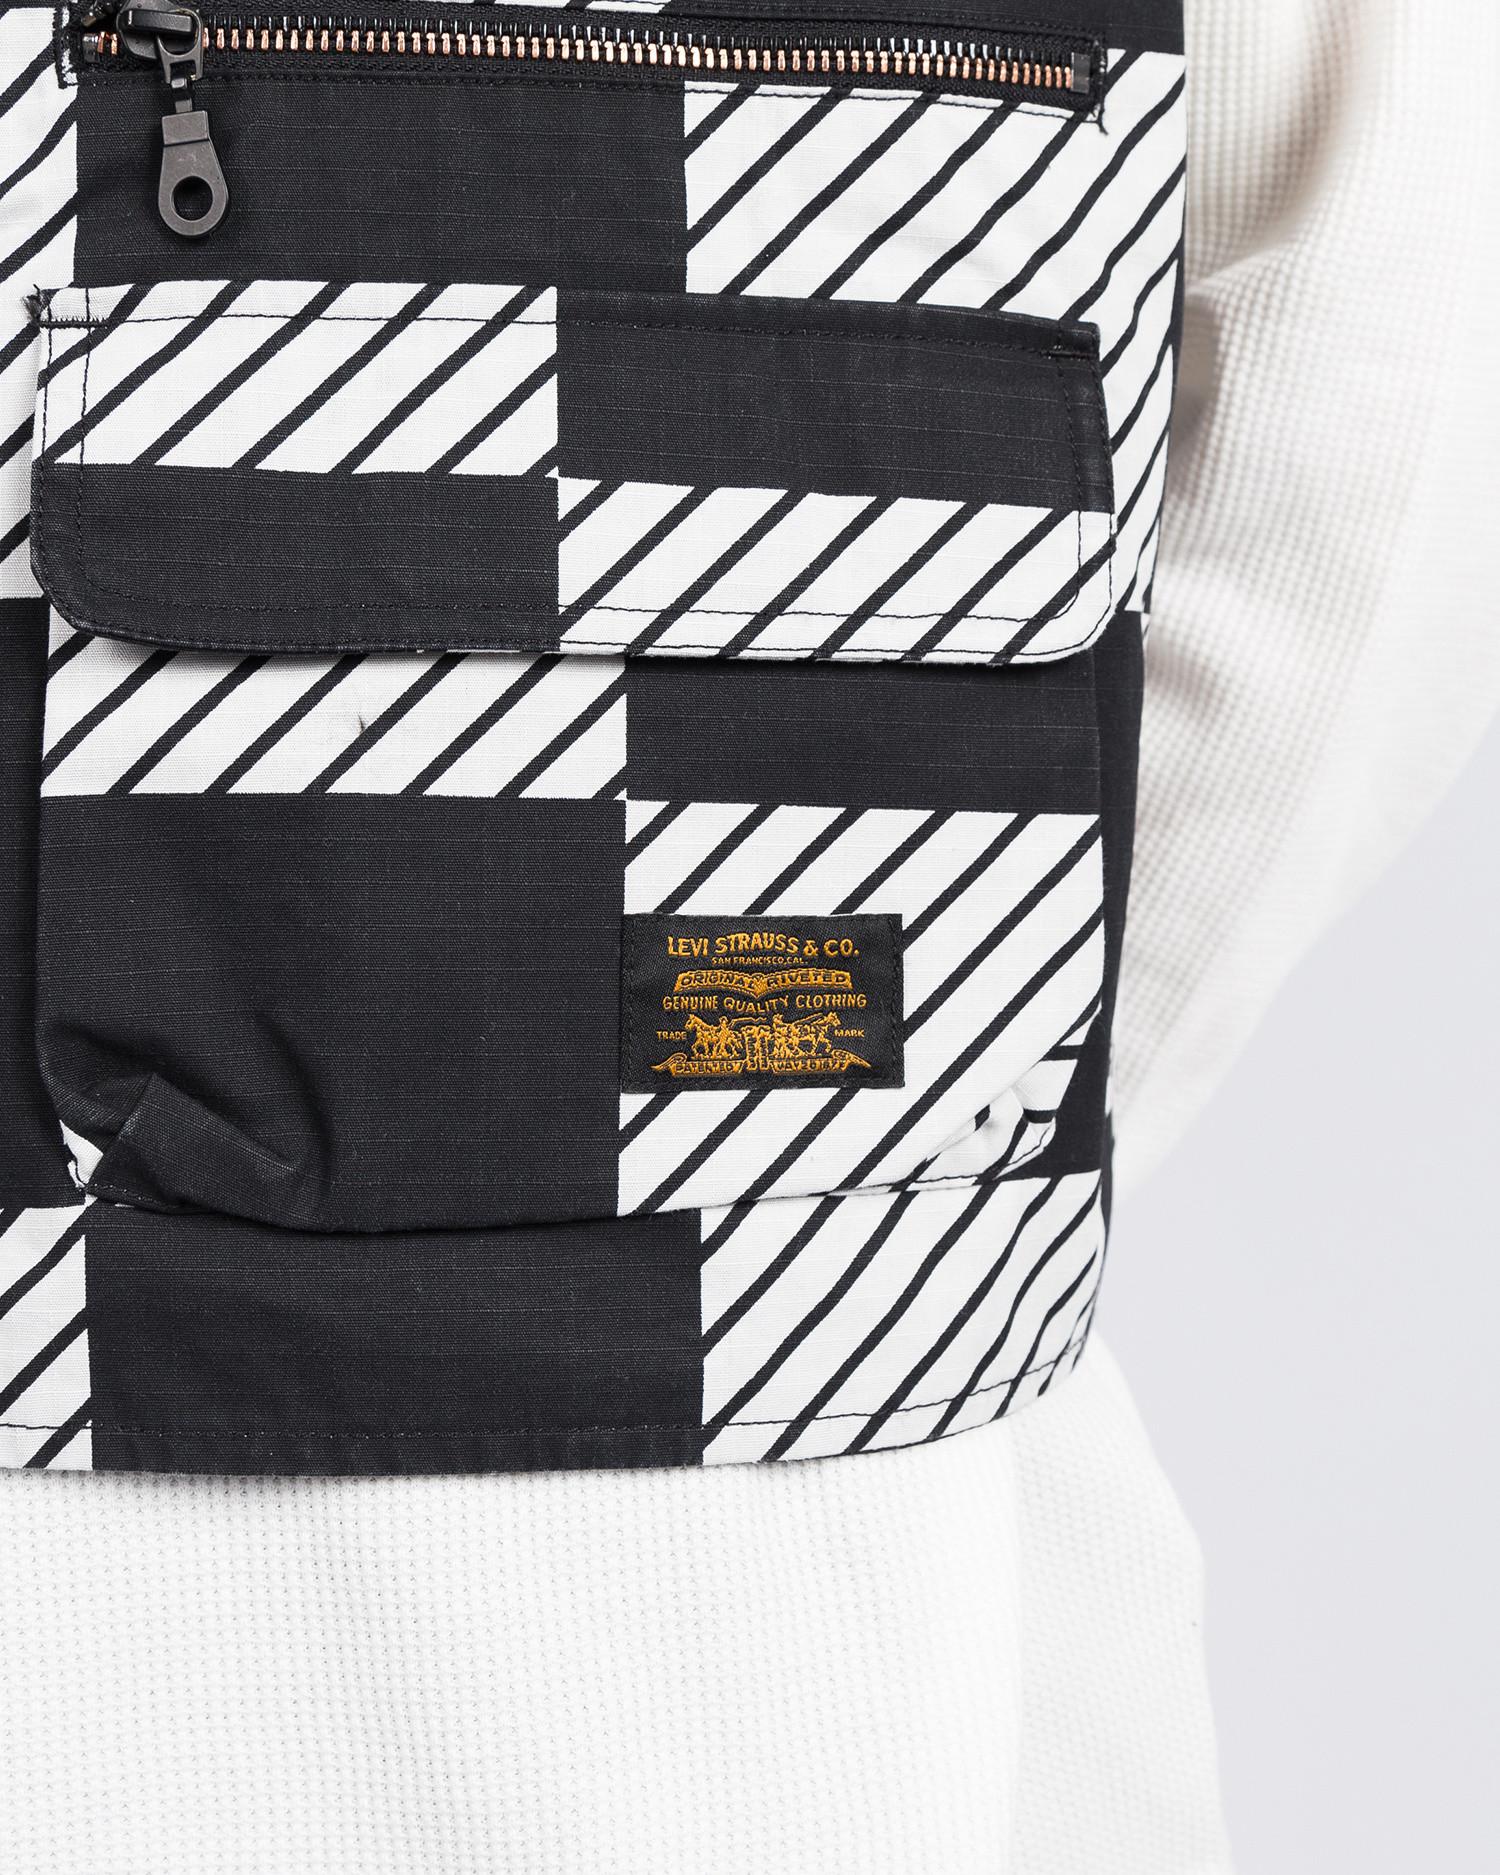 Levi's Skate Utility Vest SE Kelly Checkers Black/White